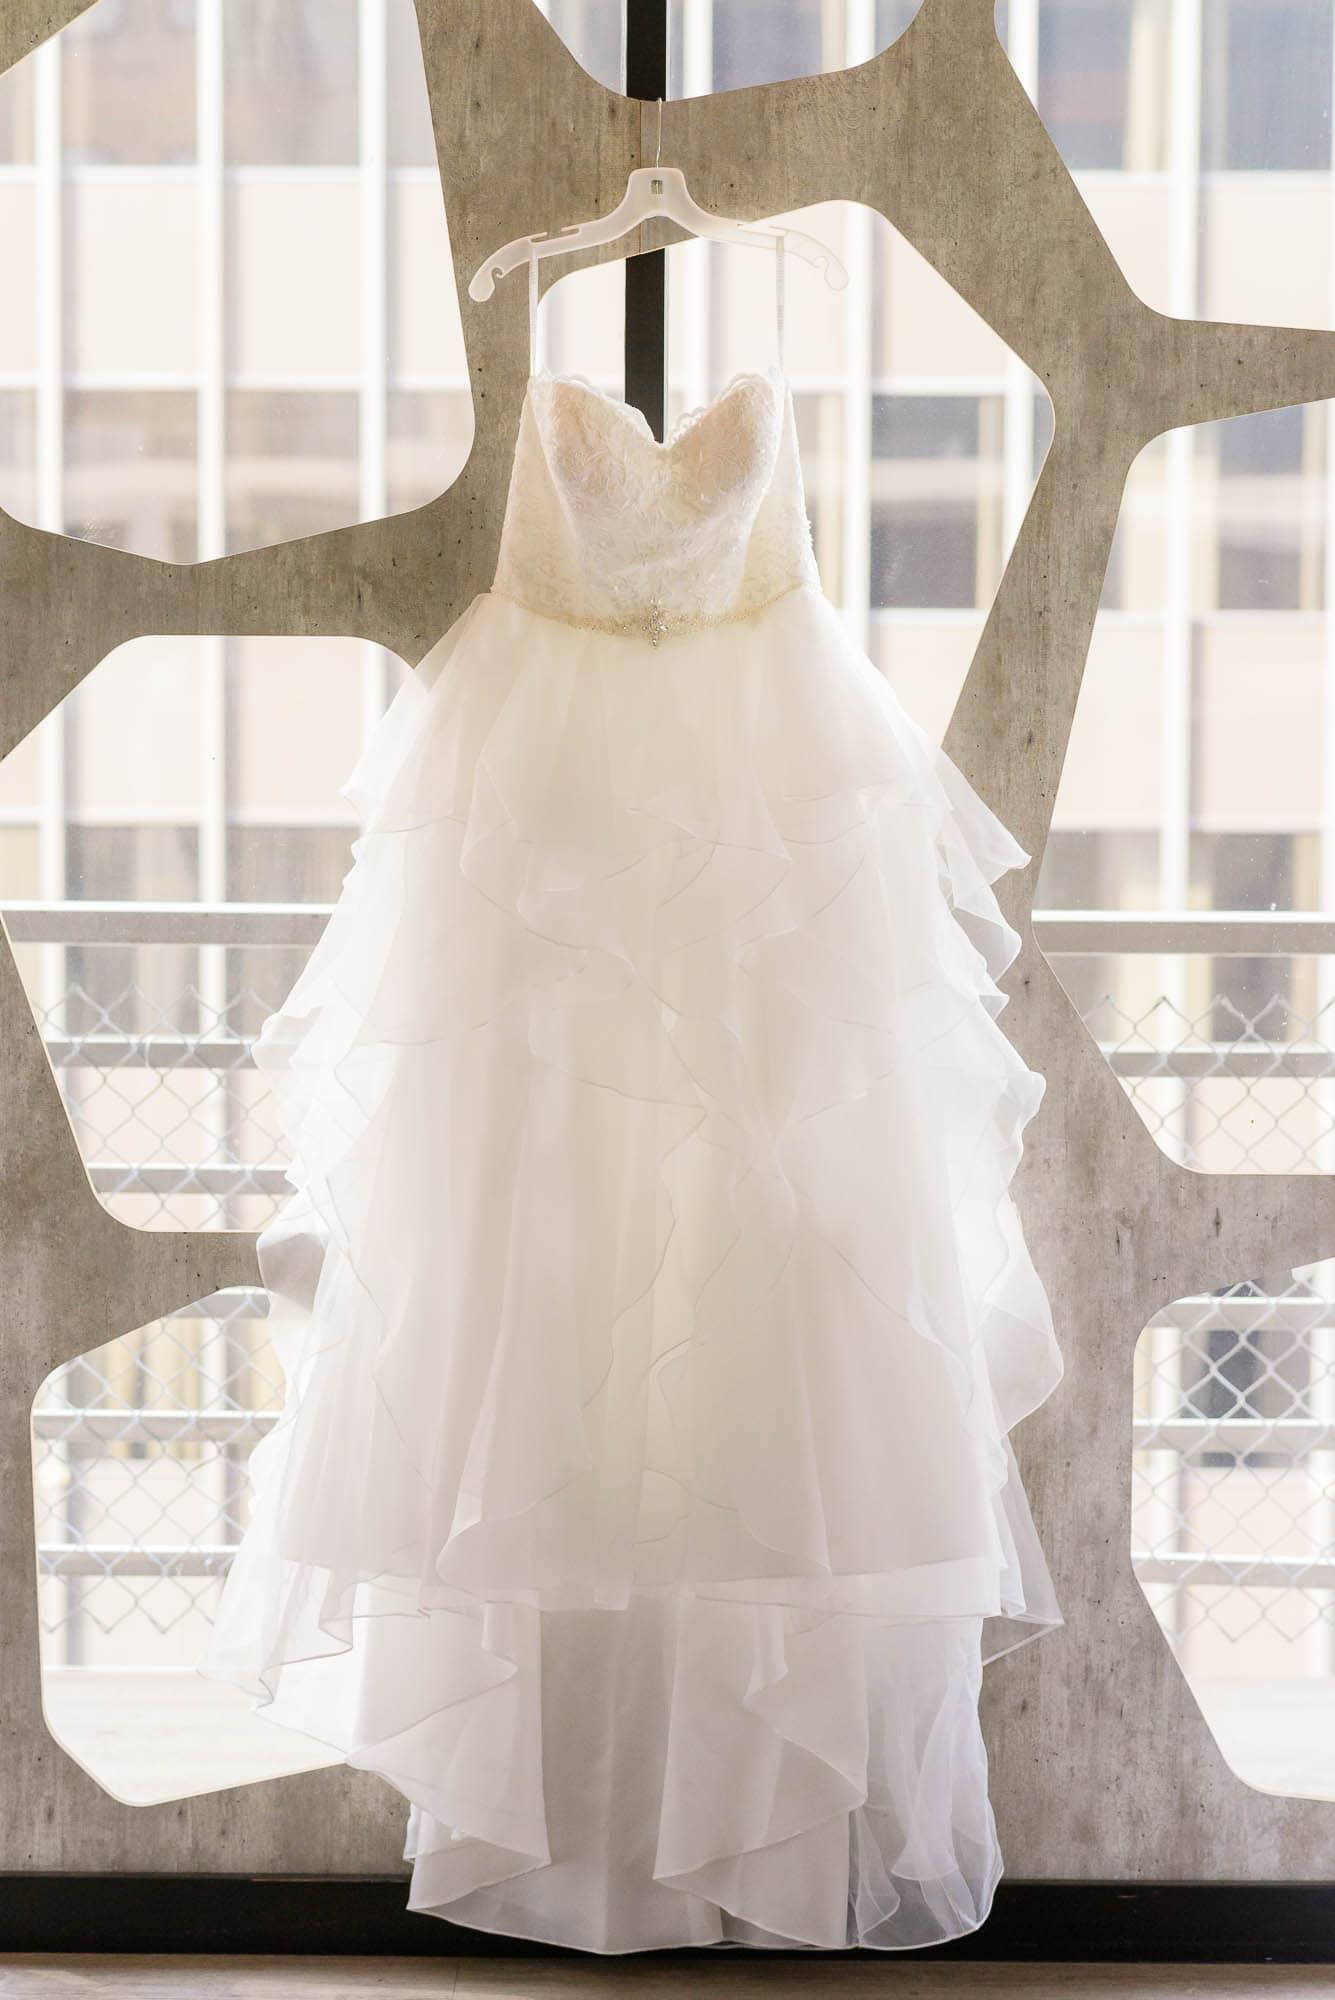 003_Alan_and_Heidi_Wedding_Nicole_Roman